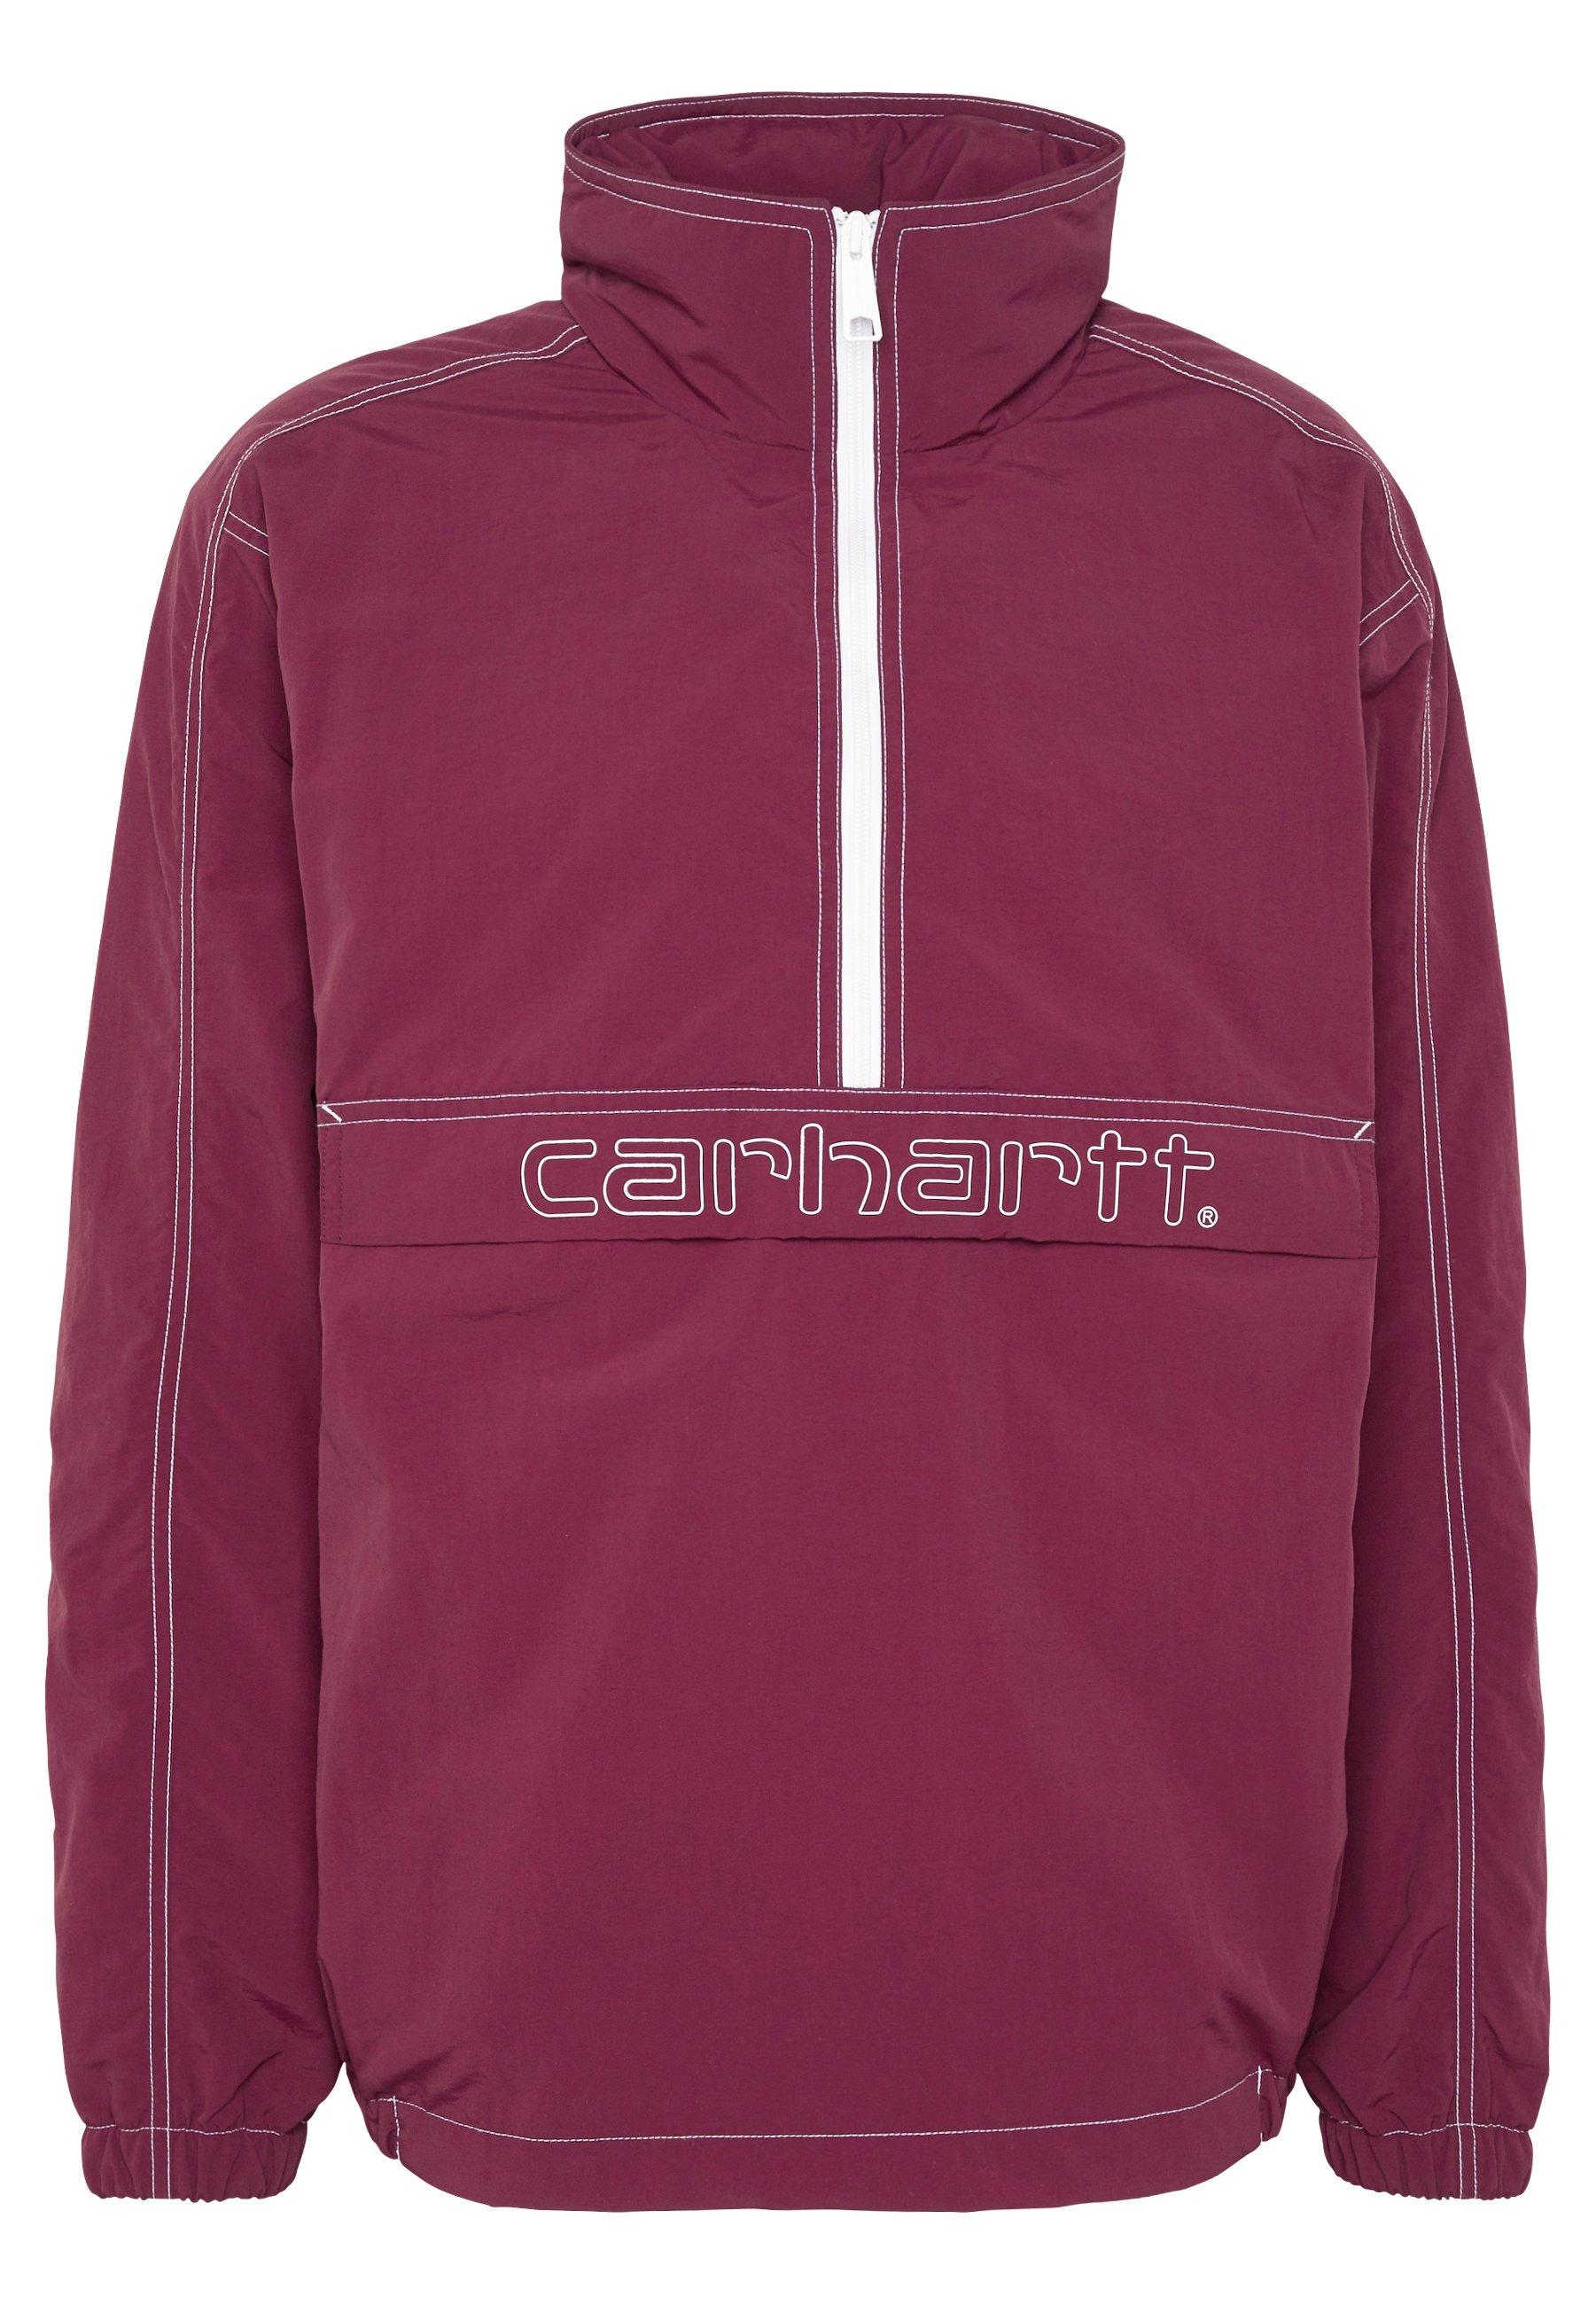 Carhartt Wip Kastor - Windbreaker Shiraz/white